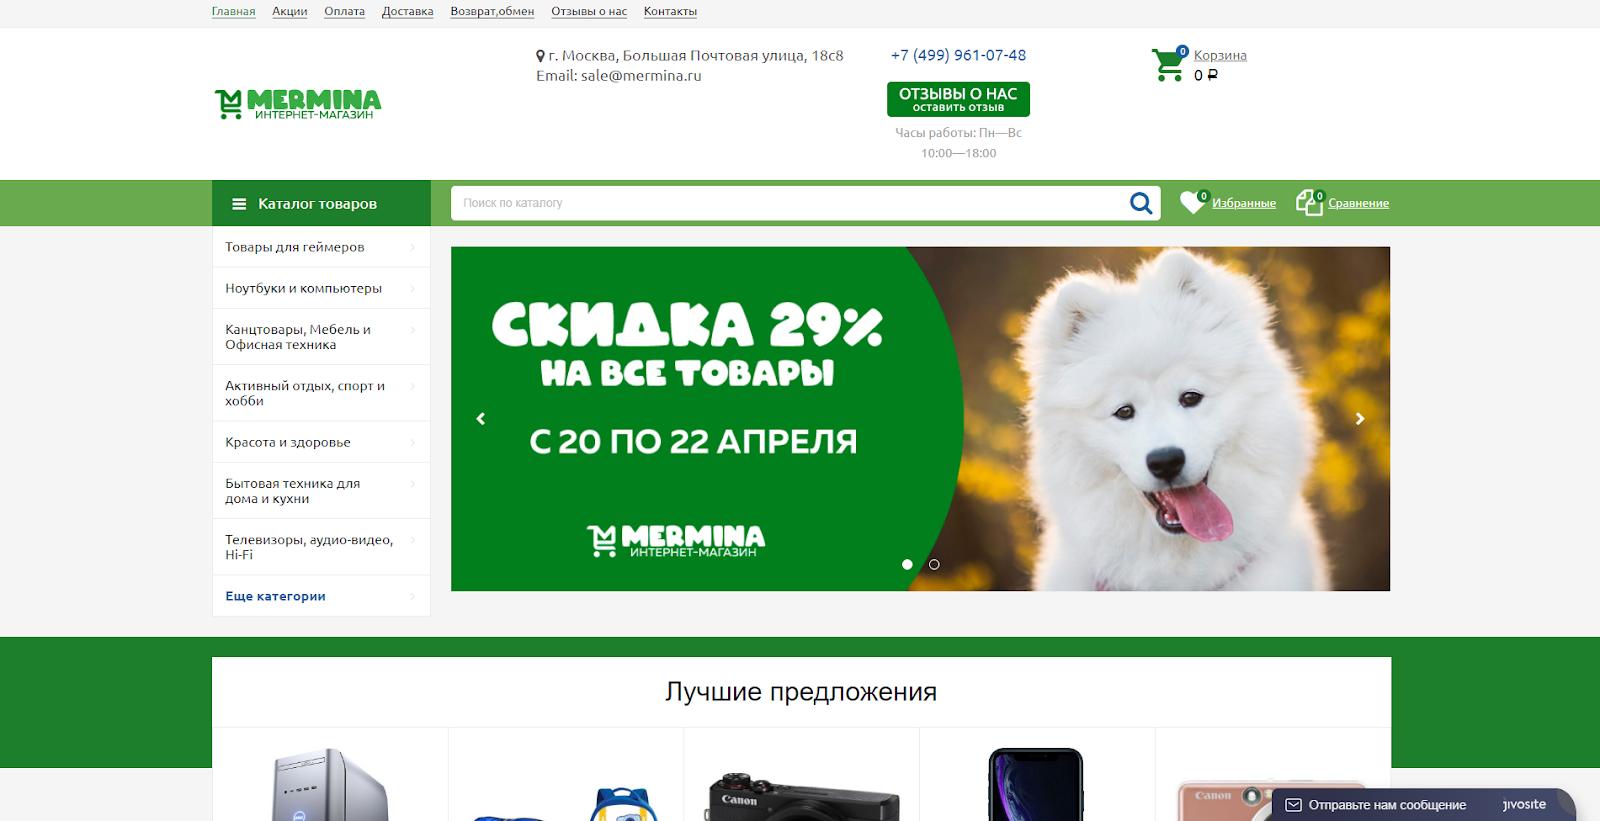 Интернет Магазин 7 499